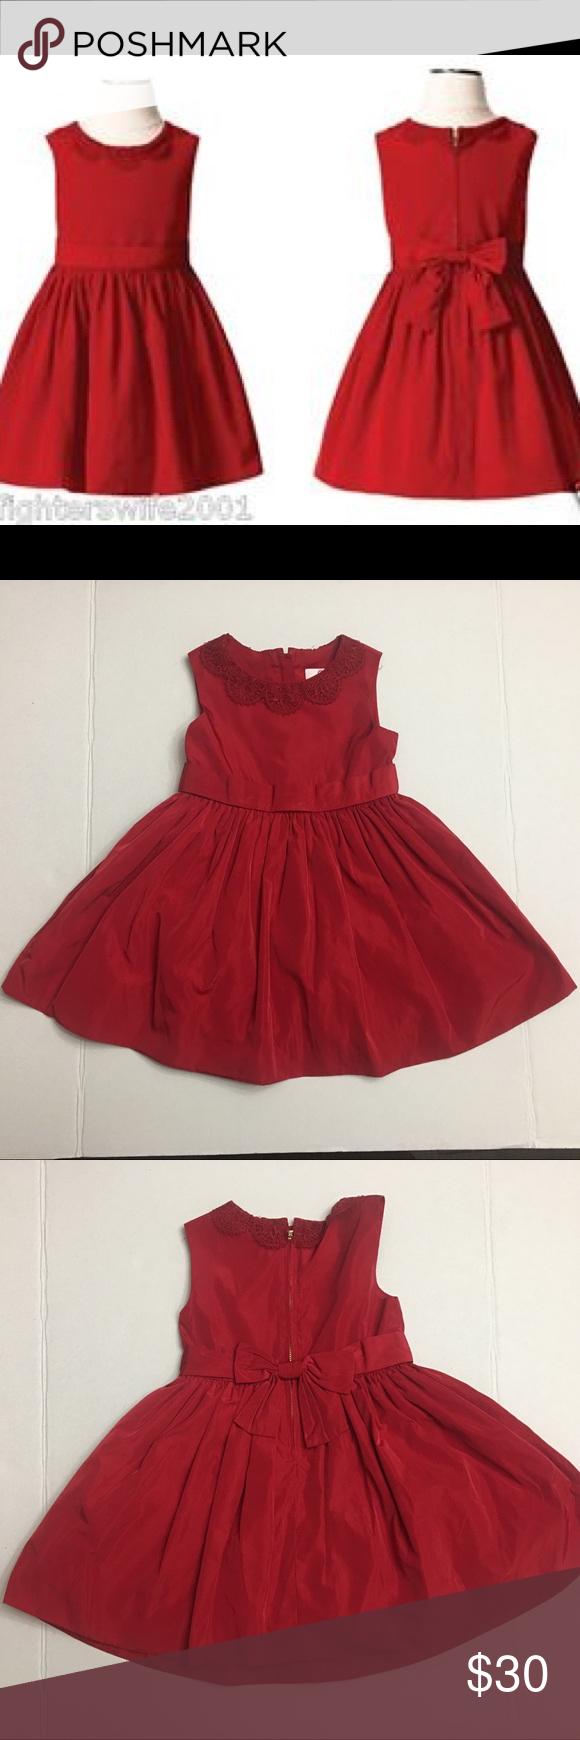 Neiman Marcus For Target Jason Wu Red Dress Jason Wu Dress Kids Dresses Fashion [ 1740 x 580 Pixel ]